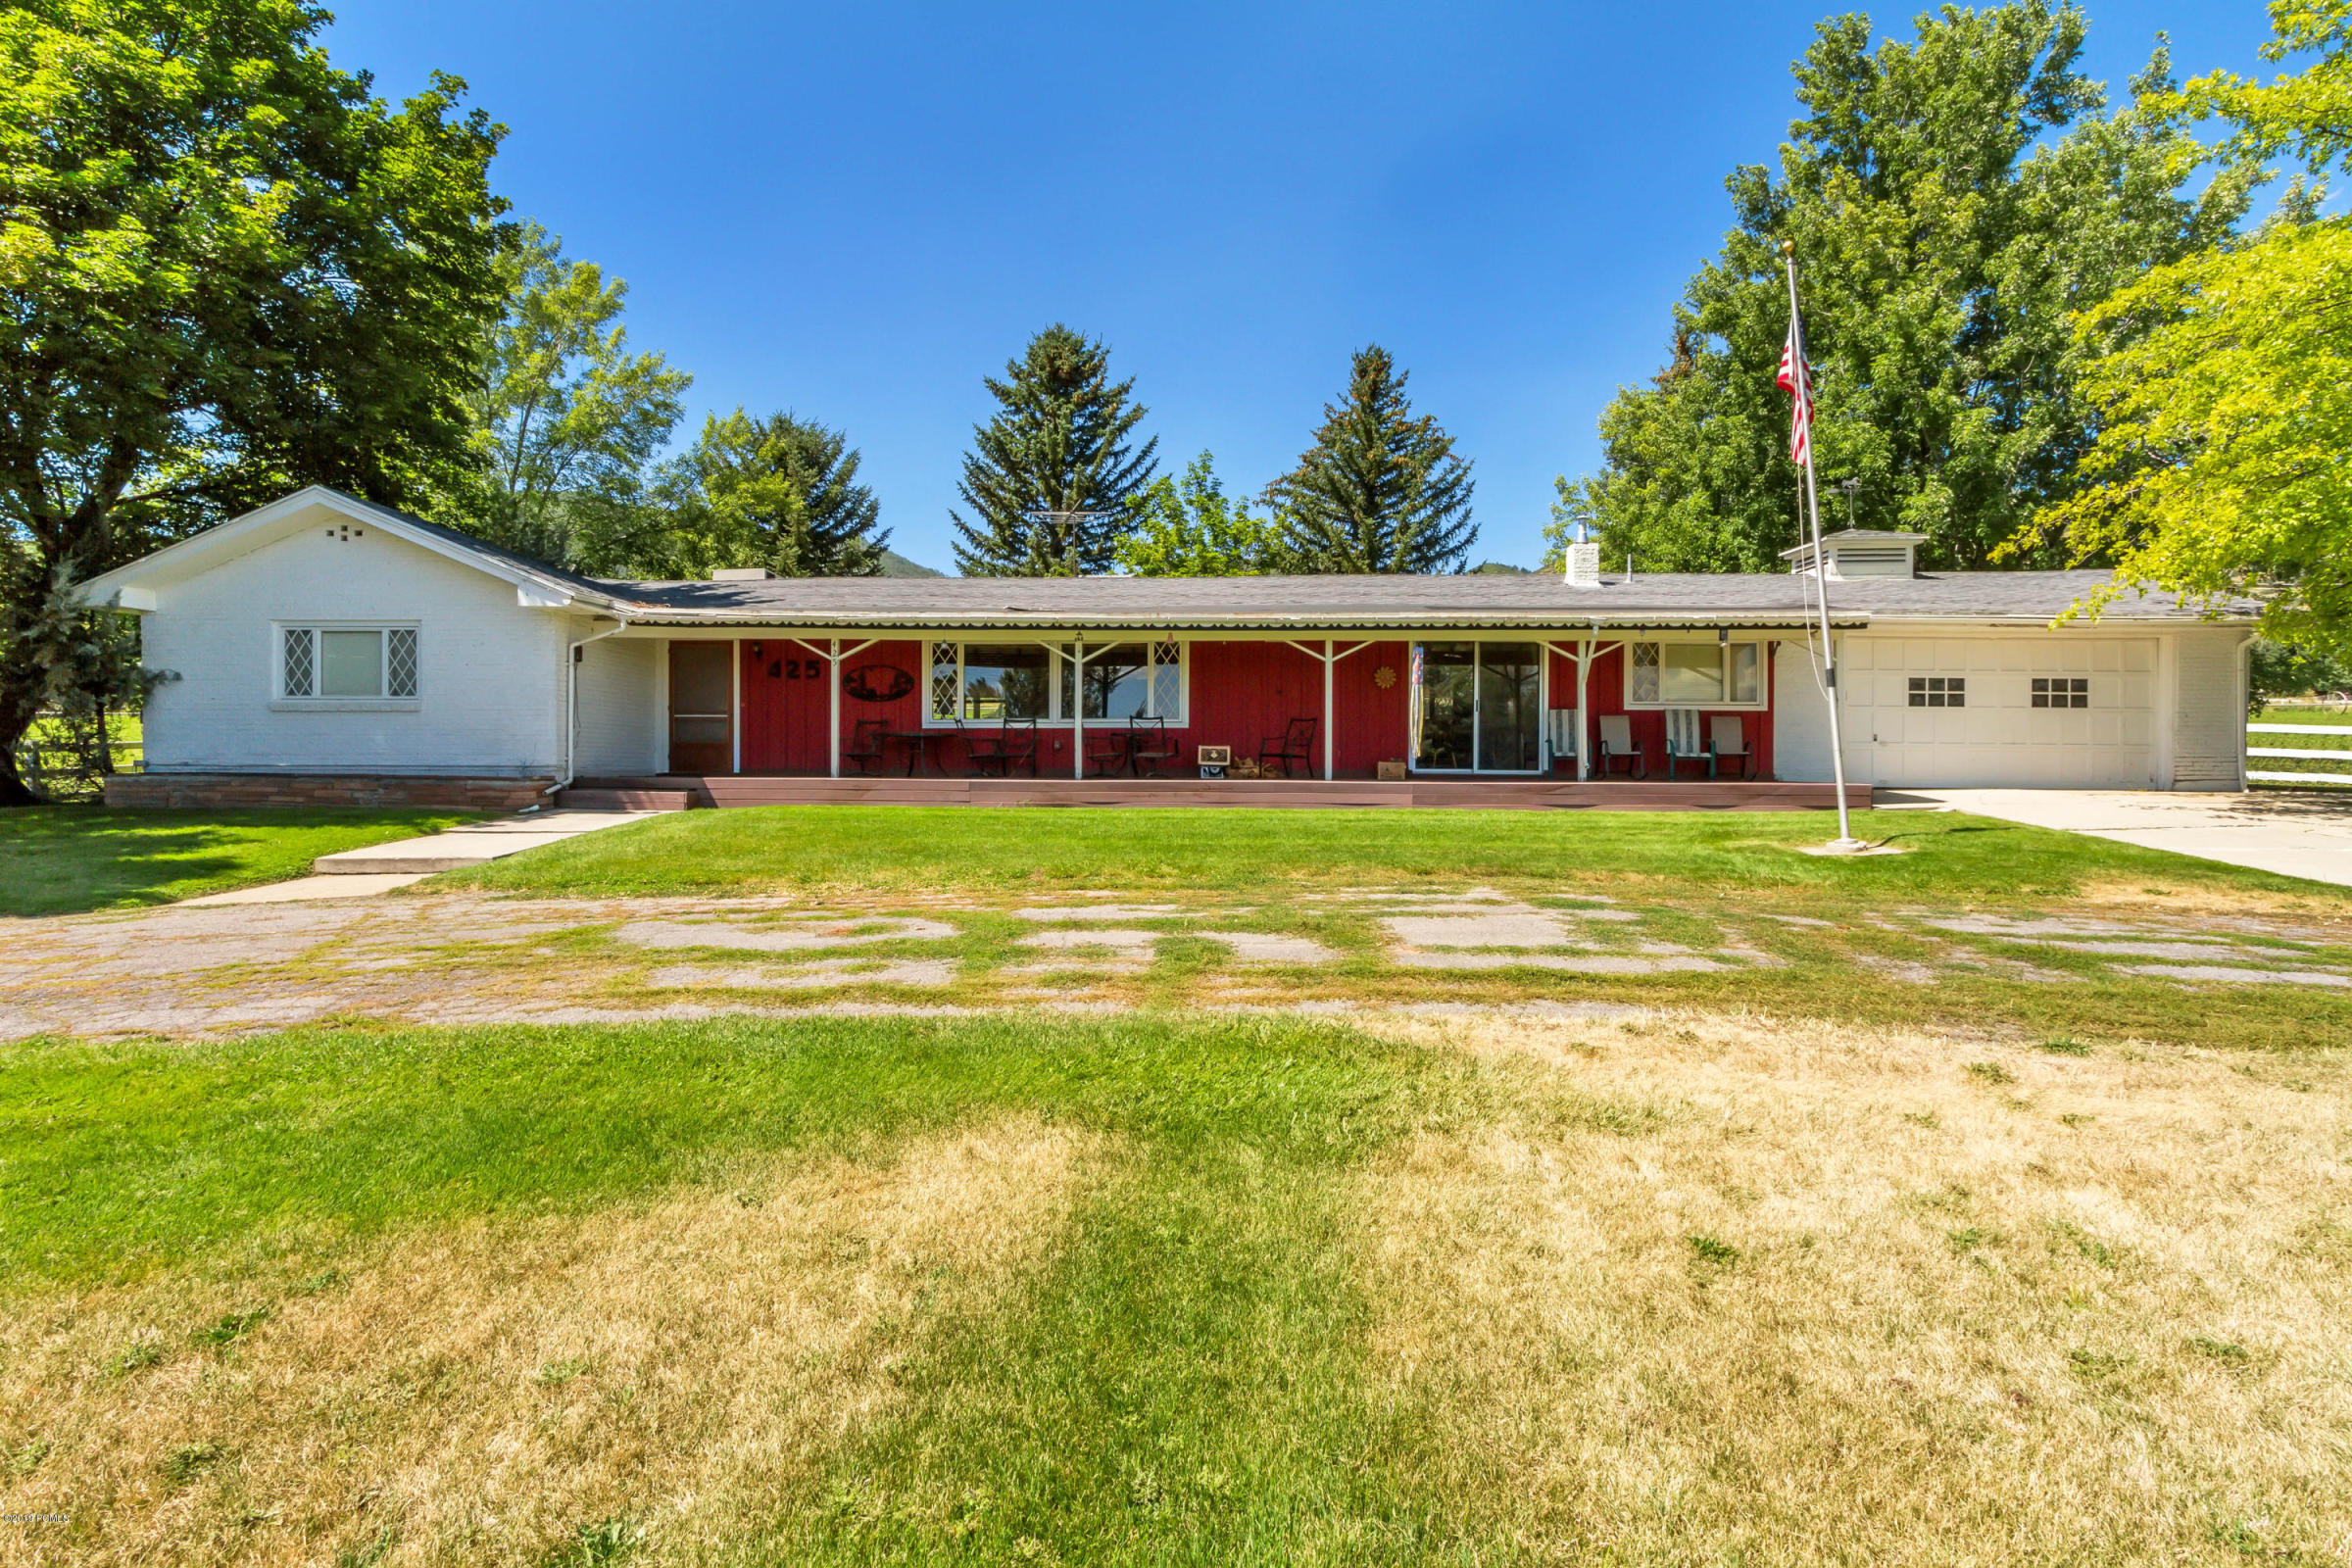 425-Homestead-Drive-Daimon-Bushi-Windermere-Utah-Park-City